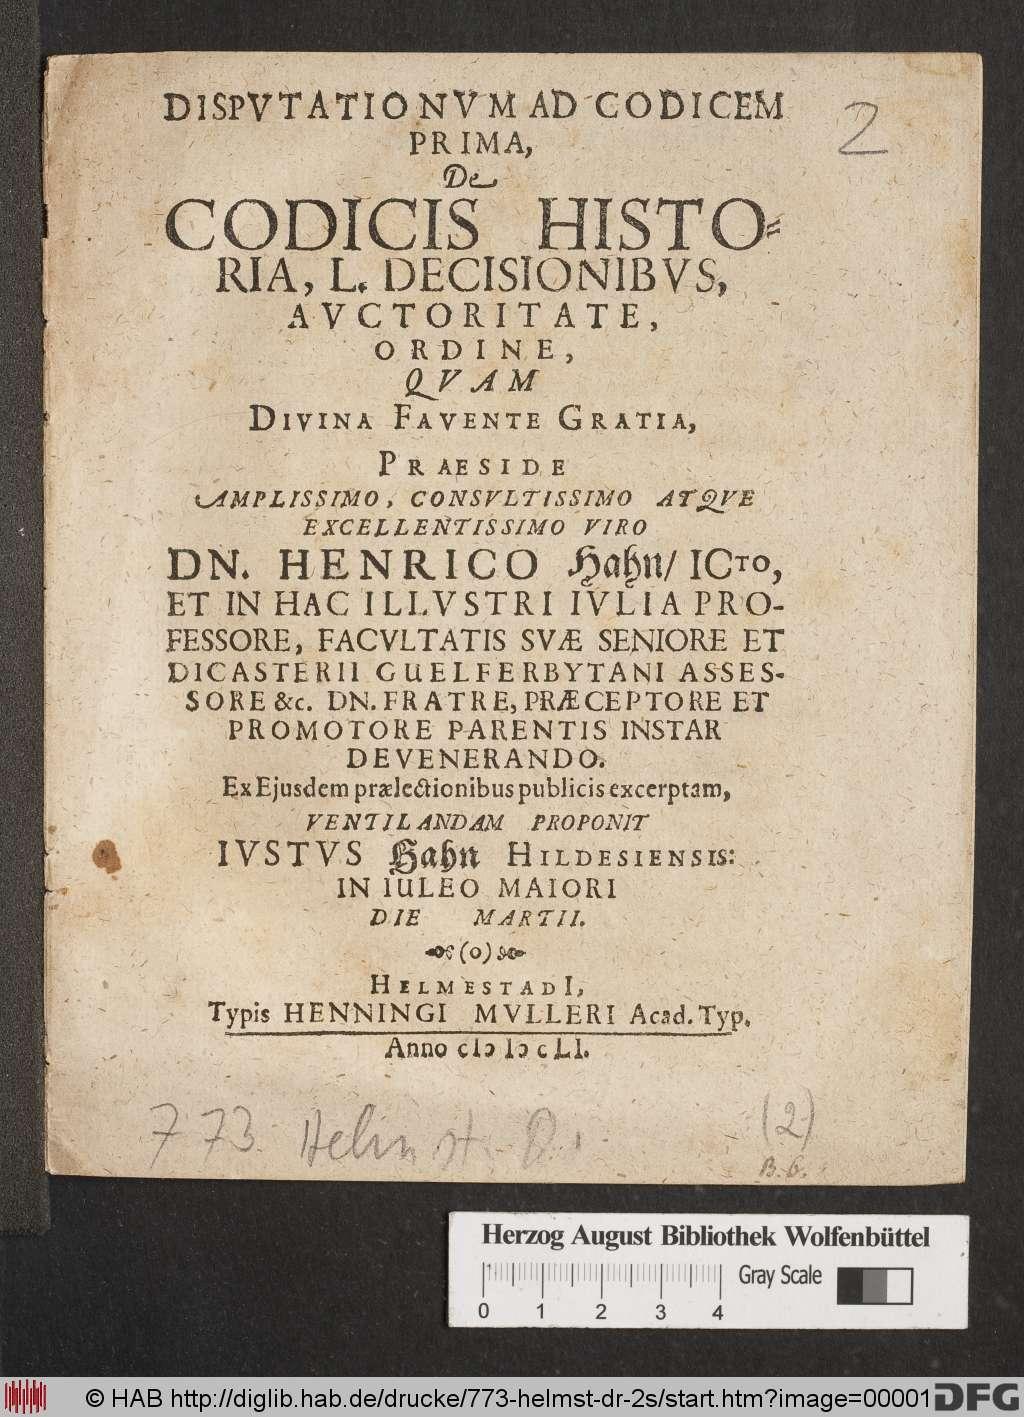 http://diglib.hab.de/drucke/773-helmst-dr-2s/00001.jpg